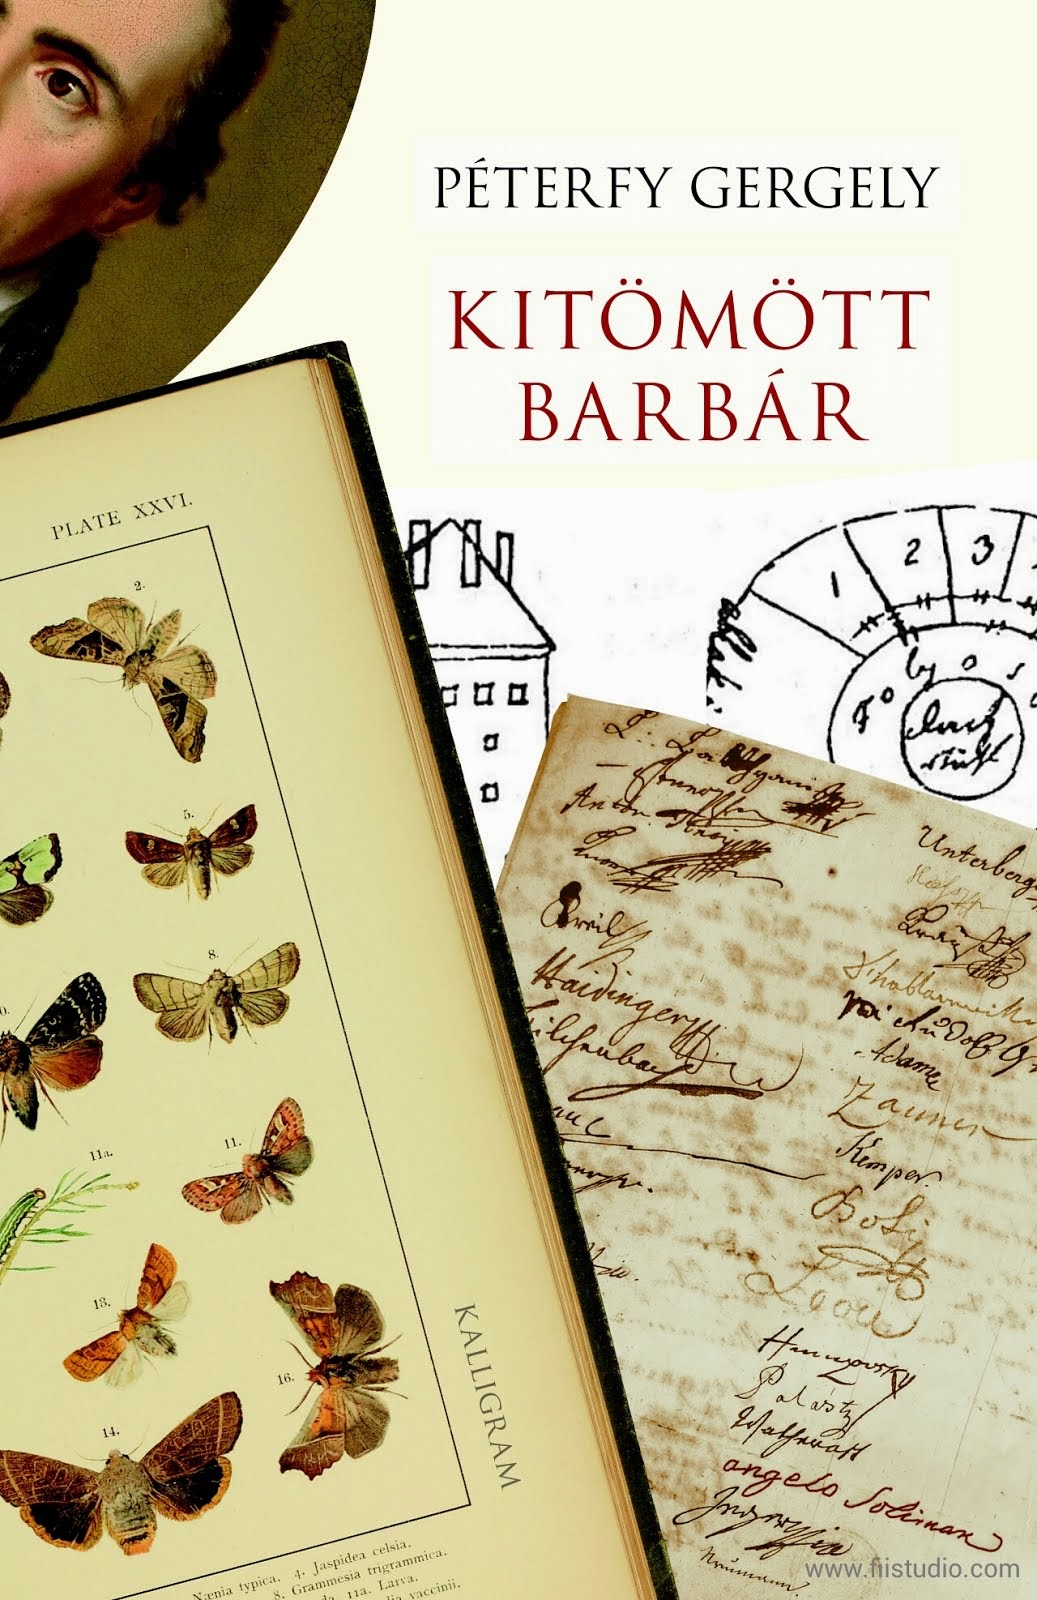 PETERFY-G_Kitomott_barbar_COVER_1